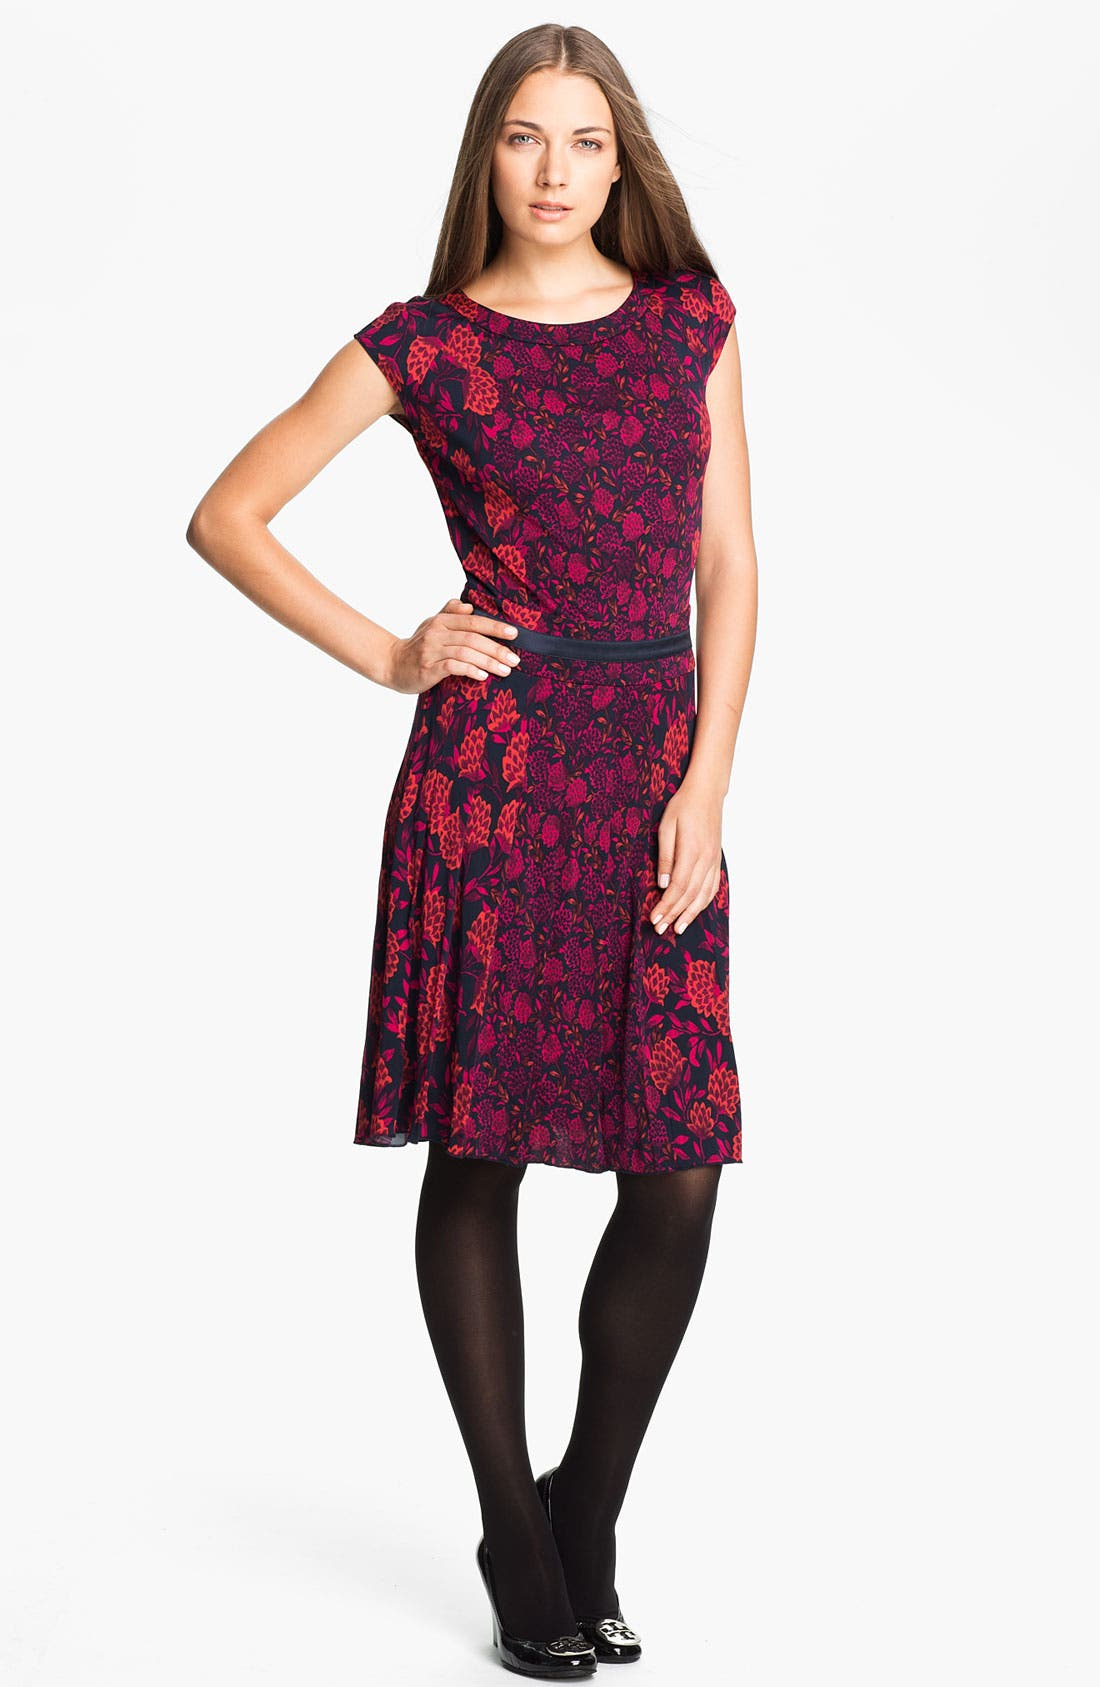 Main Image - Tory Burch 'Tamia' Print Blouson Dress